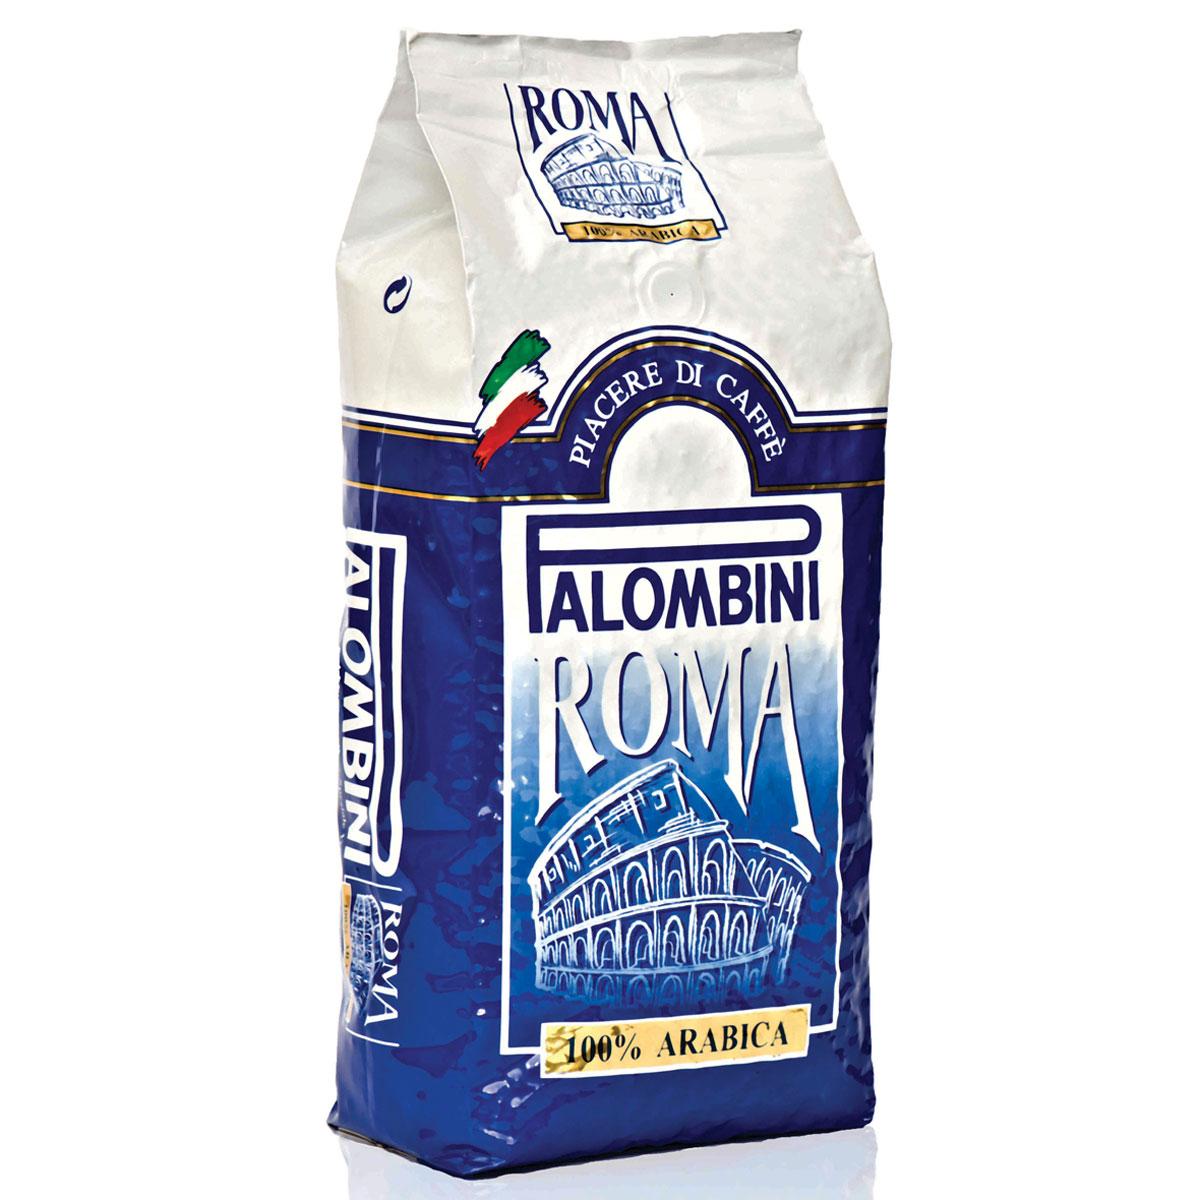 Palombini Roma 100% Arabica кофе в зернах, 1 кг кофе в зернах palombini pal caffe rosso special line 1 кг